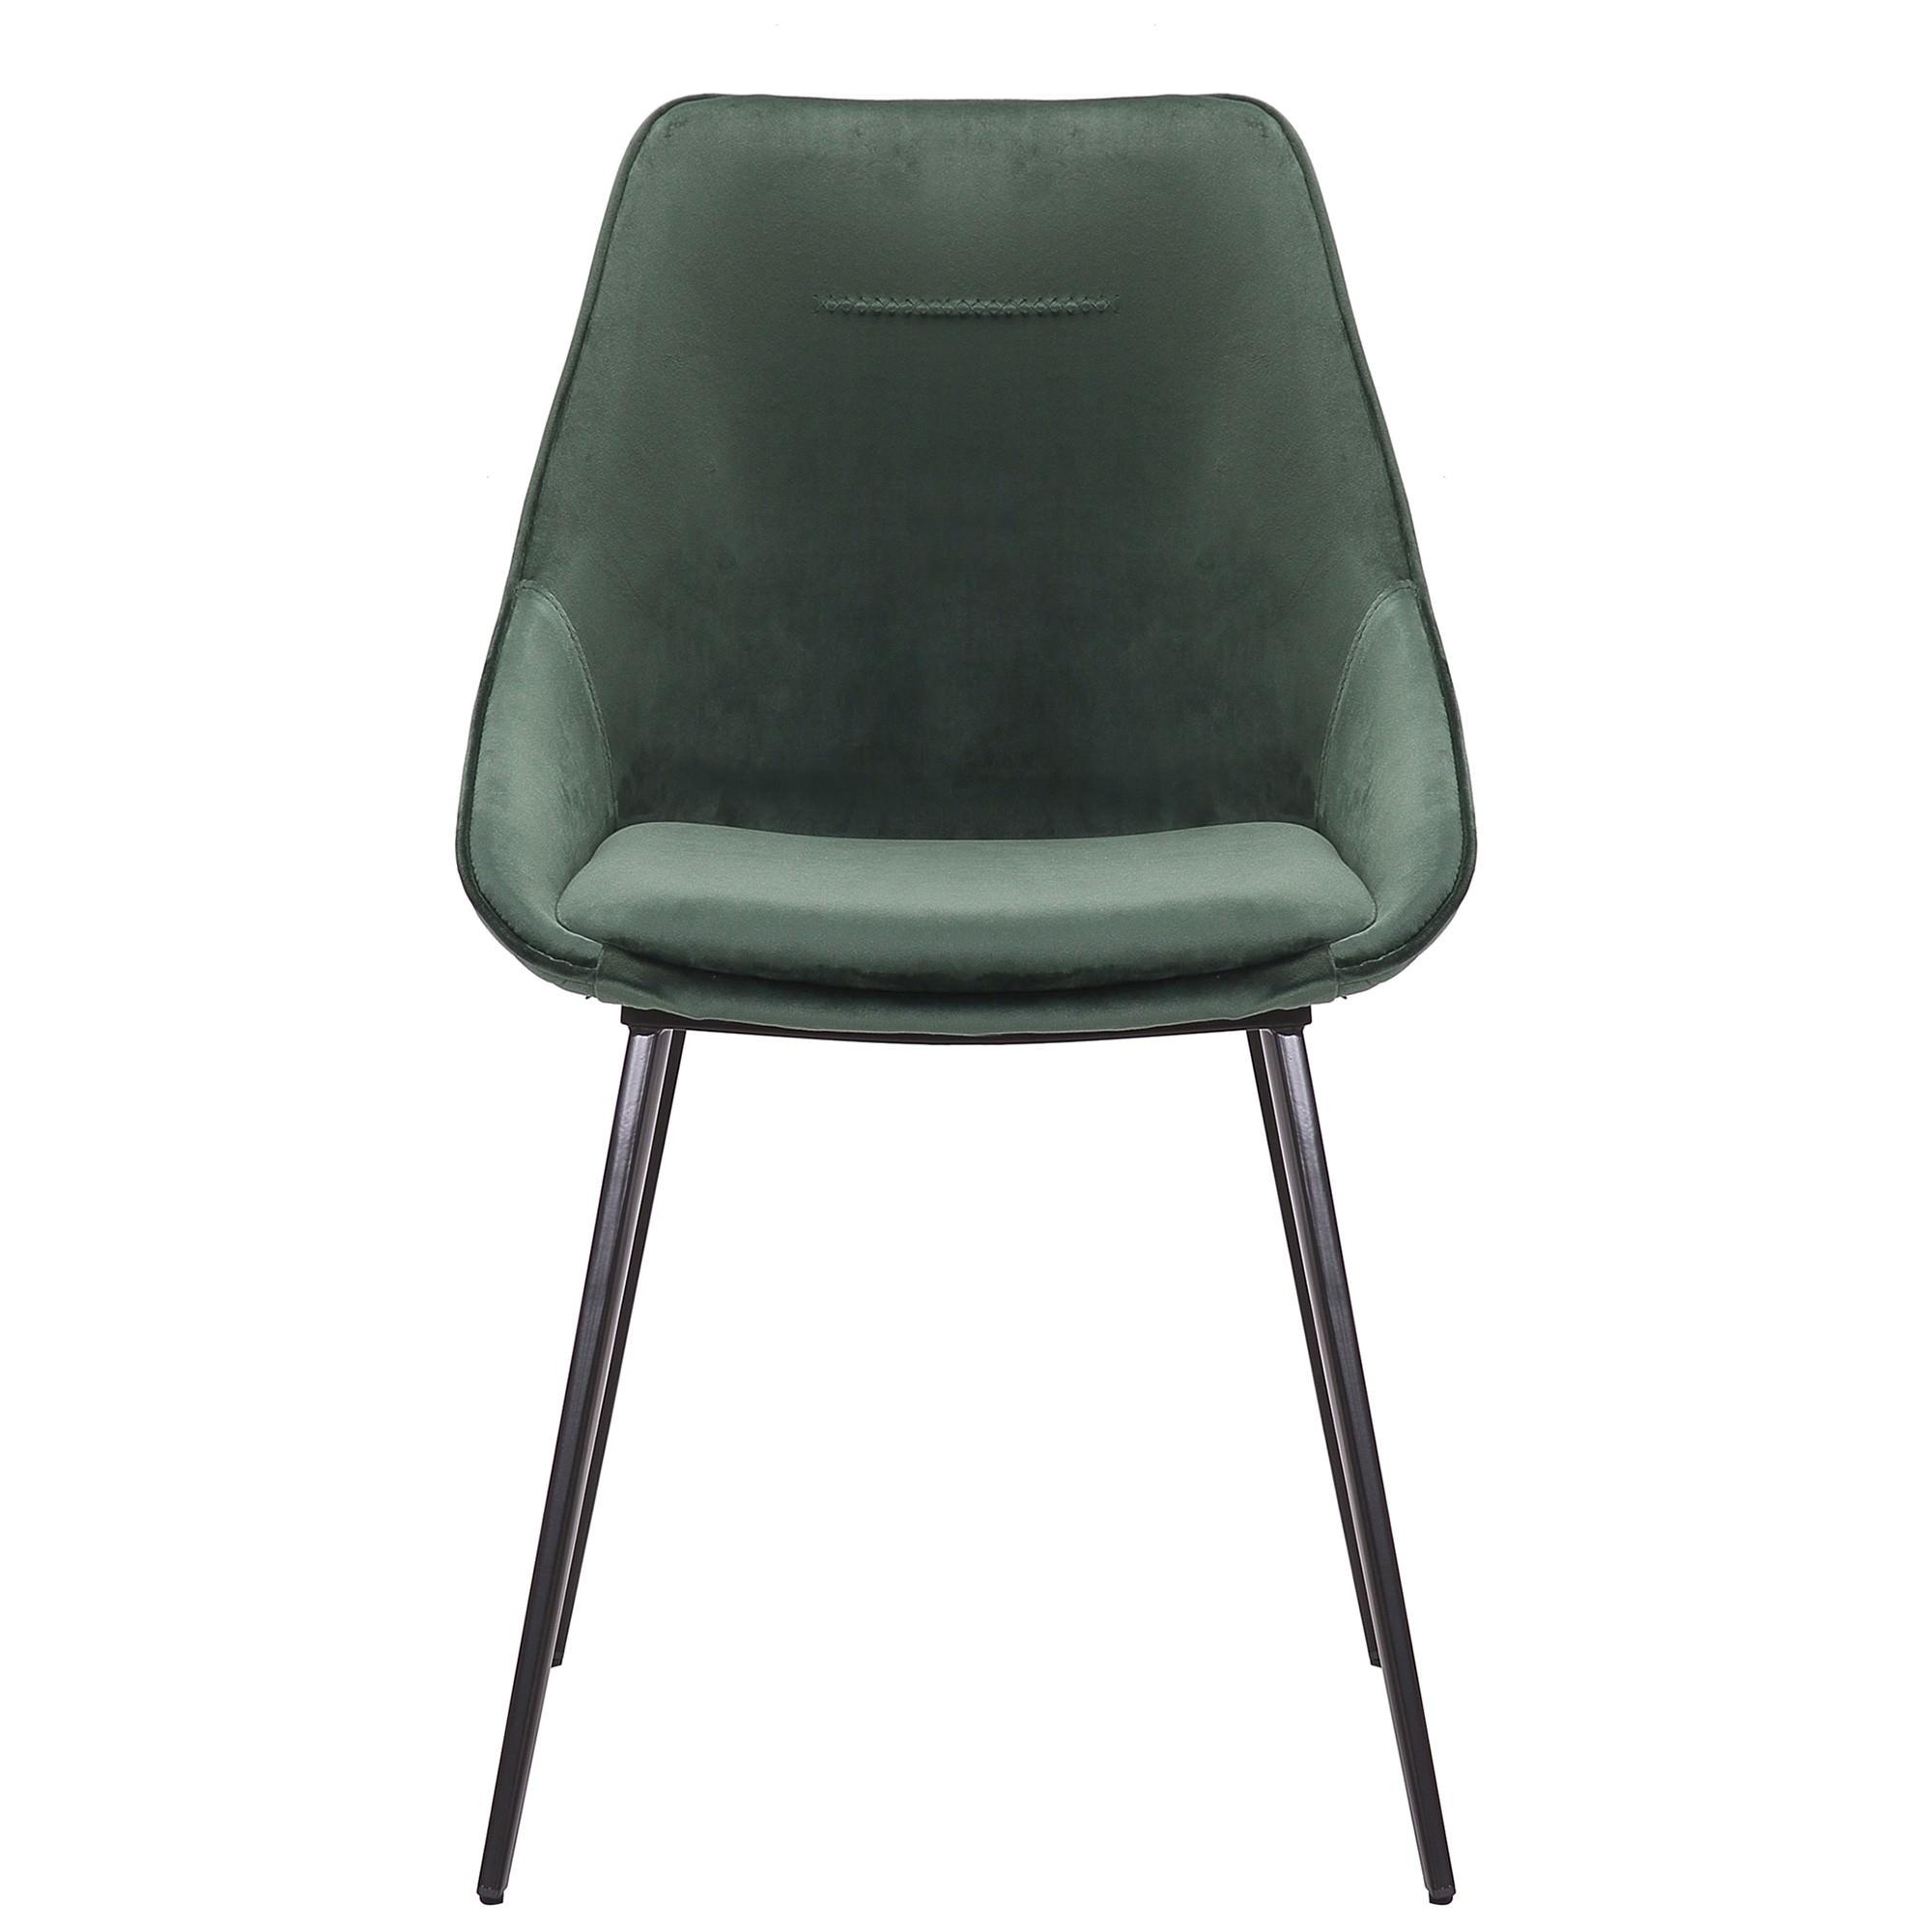 Bellagio Commercial Grade Velvet Fabric Dining Chair, Emerald